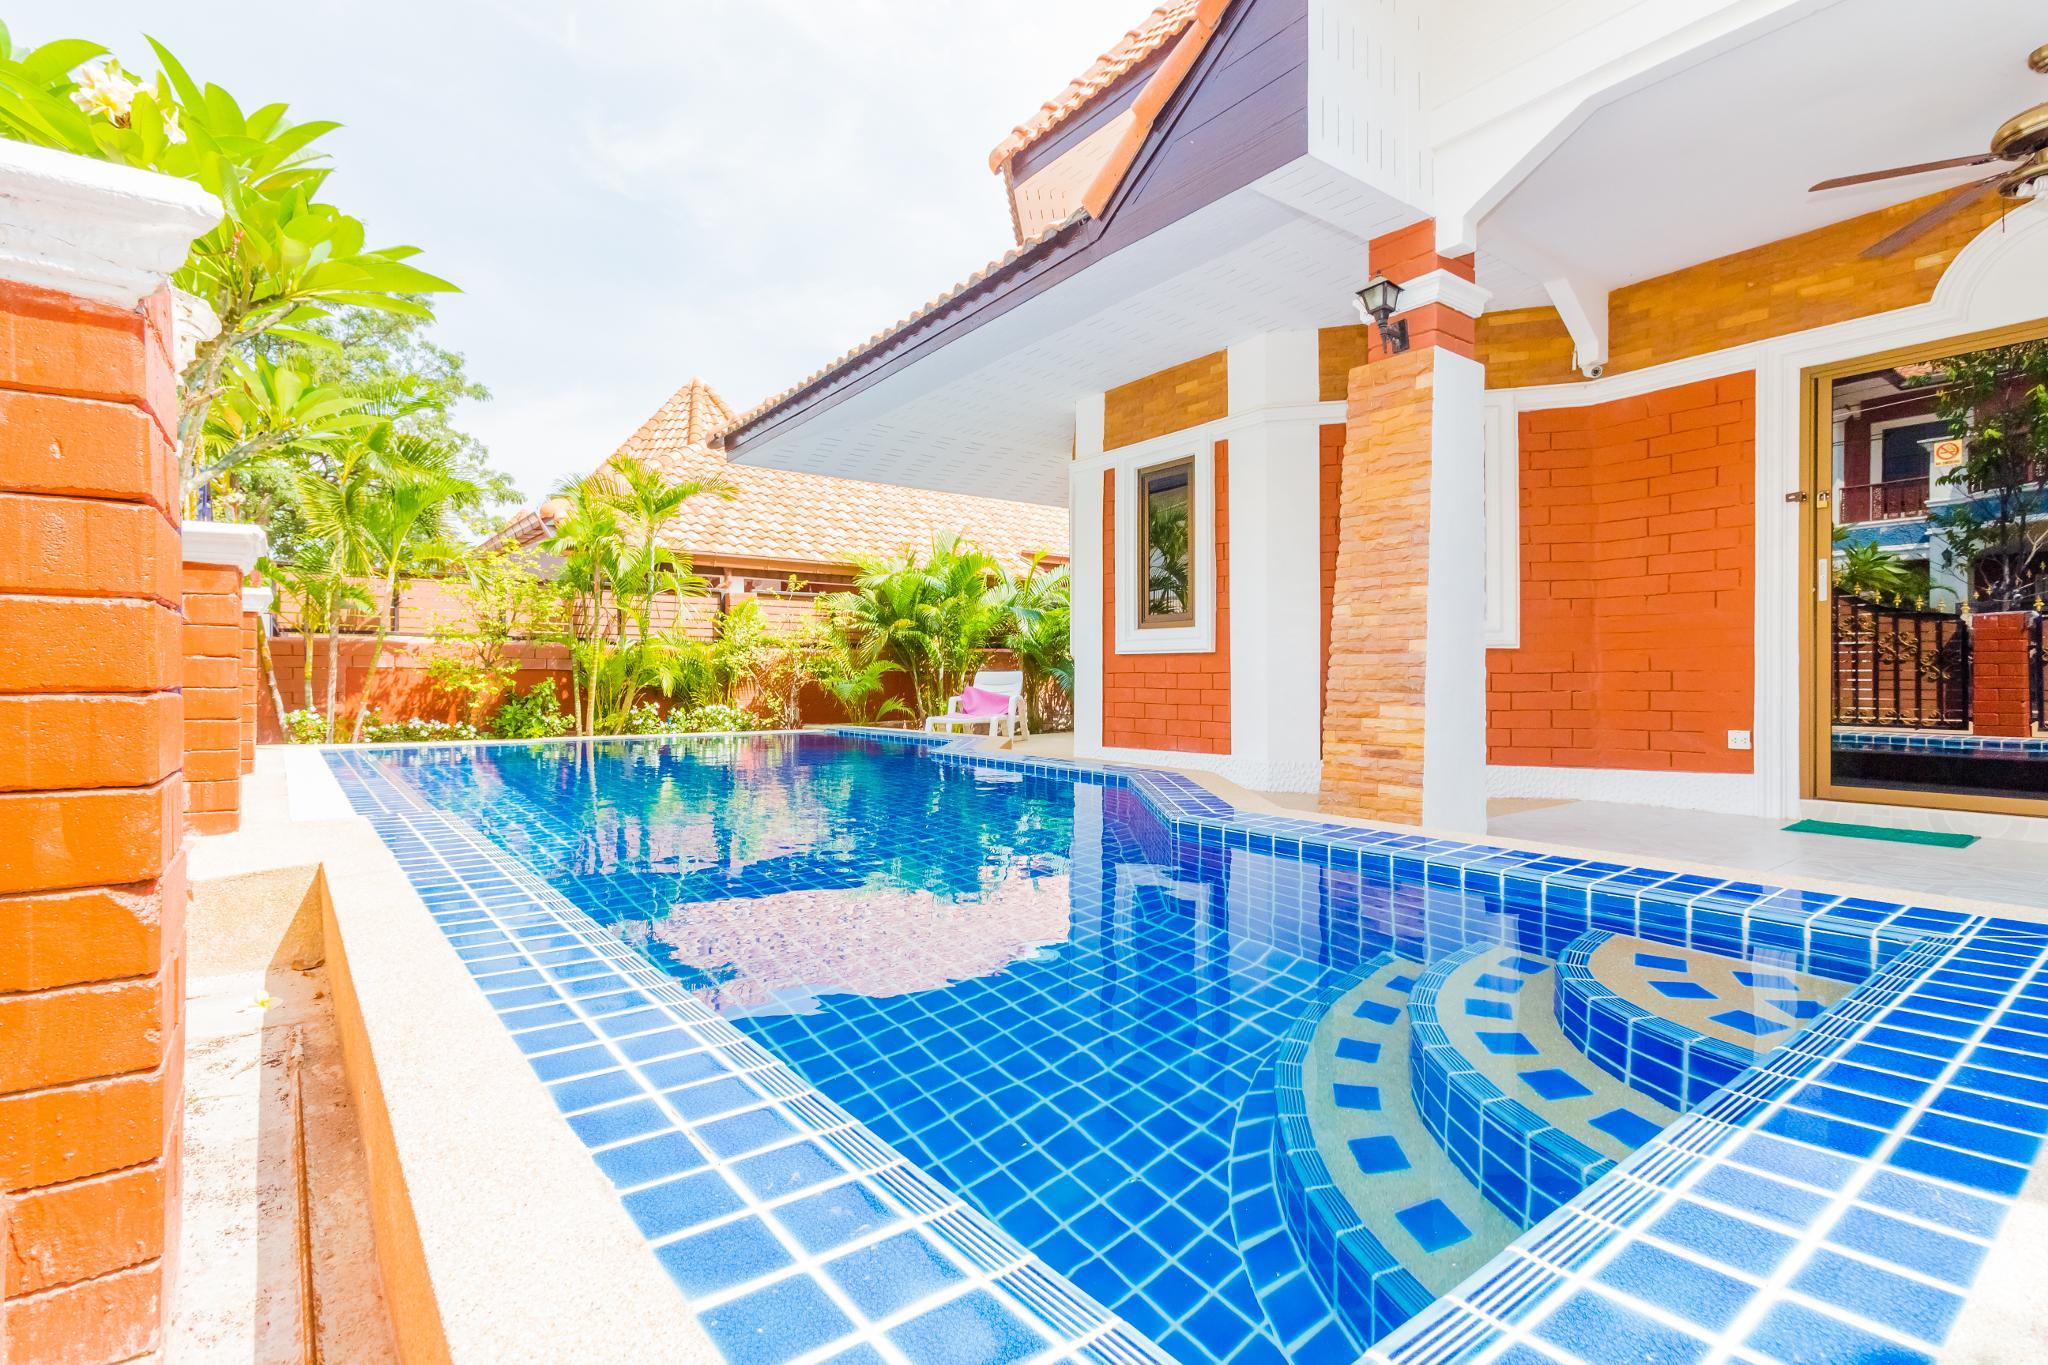 Pool villa garden 4 bedrooms near walking street,Pool villa garden 4 bedrooms near walking street